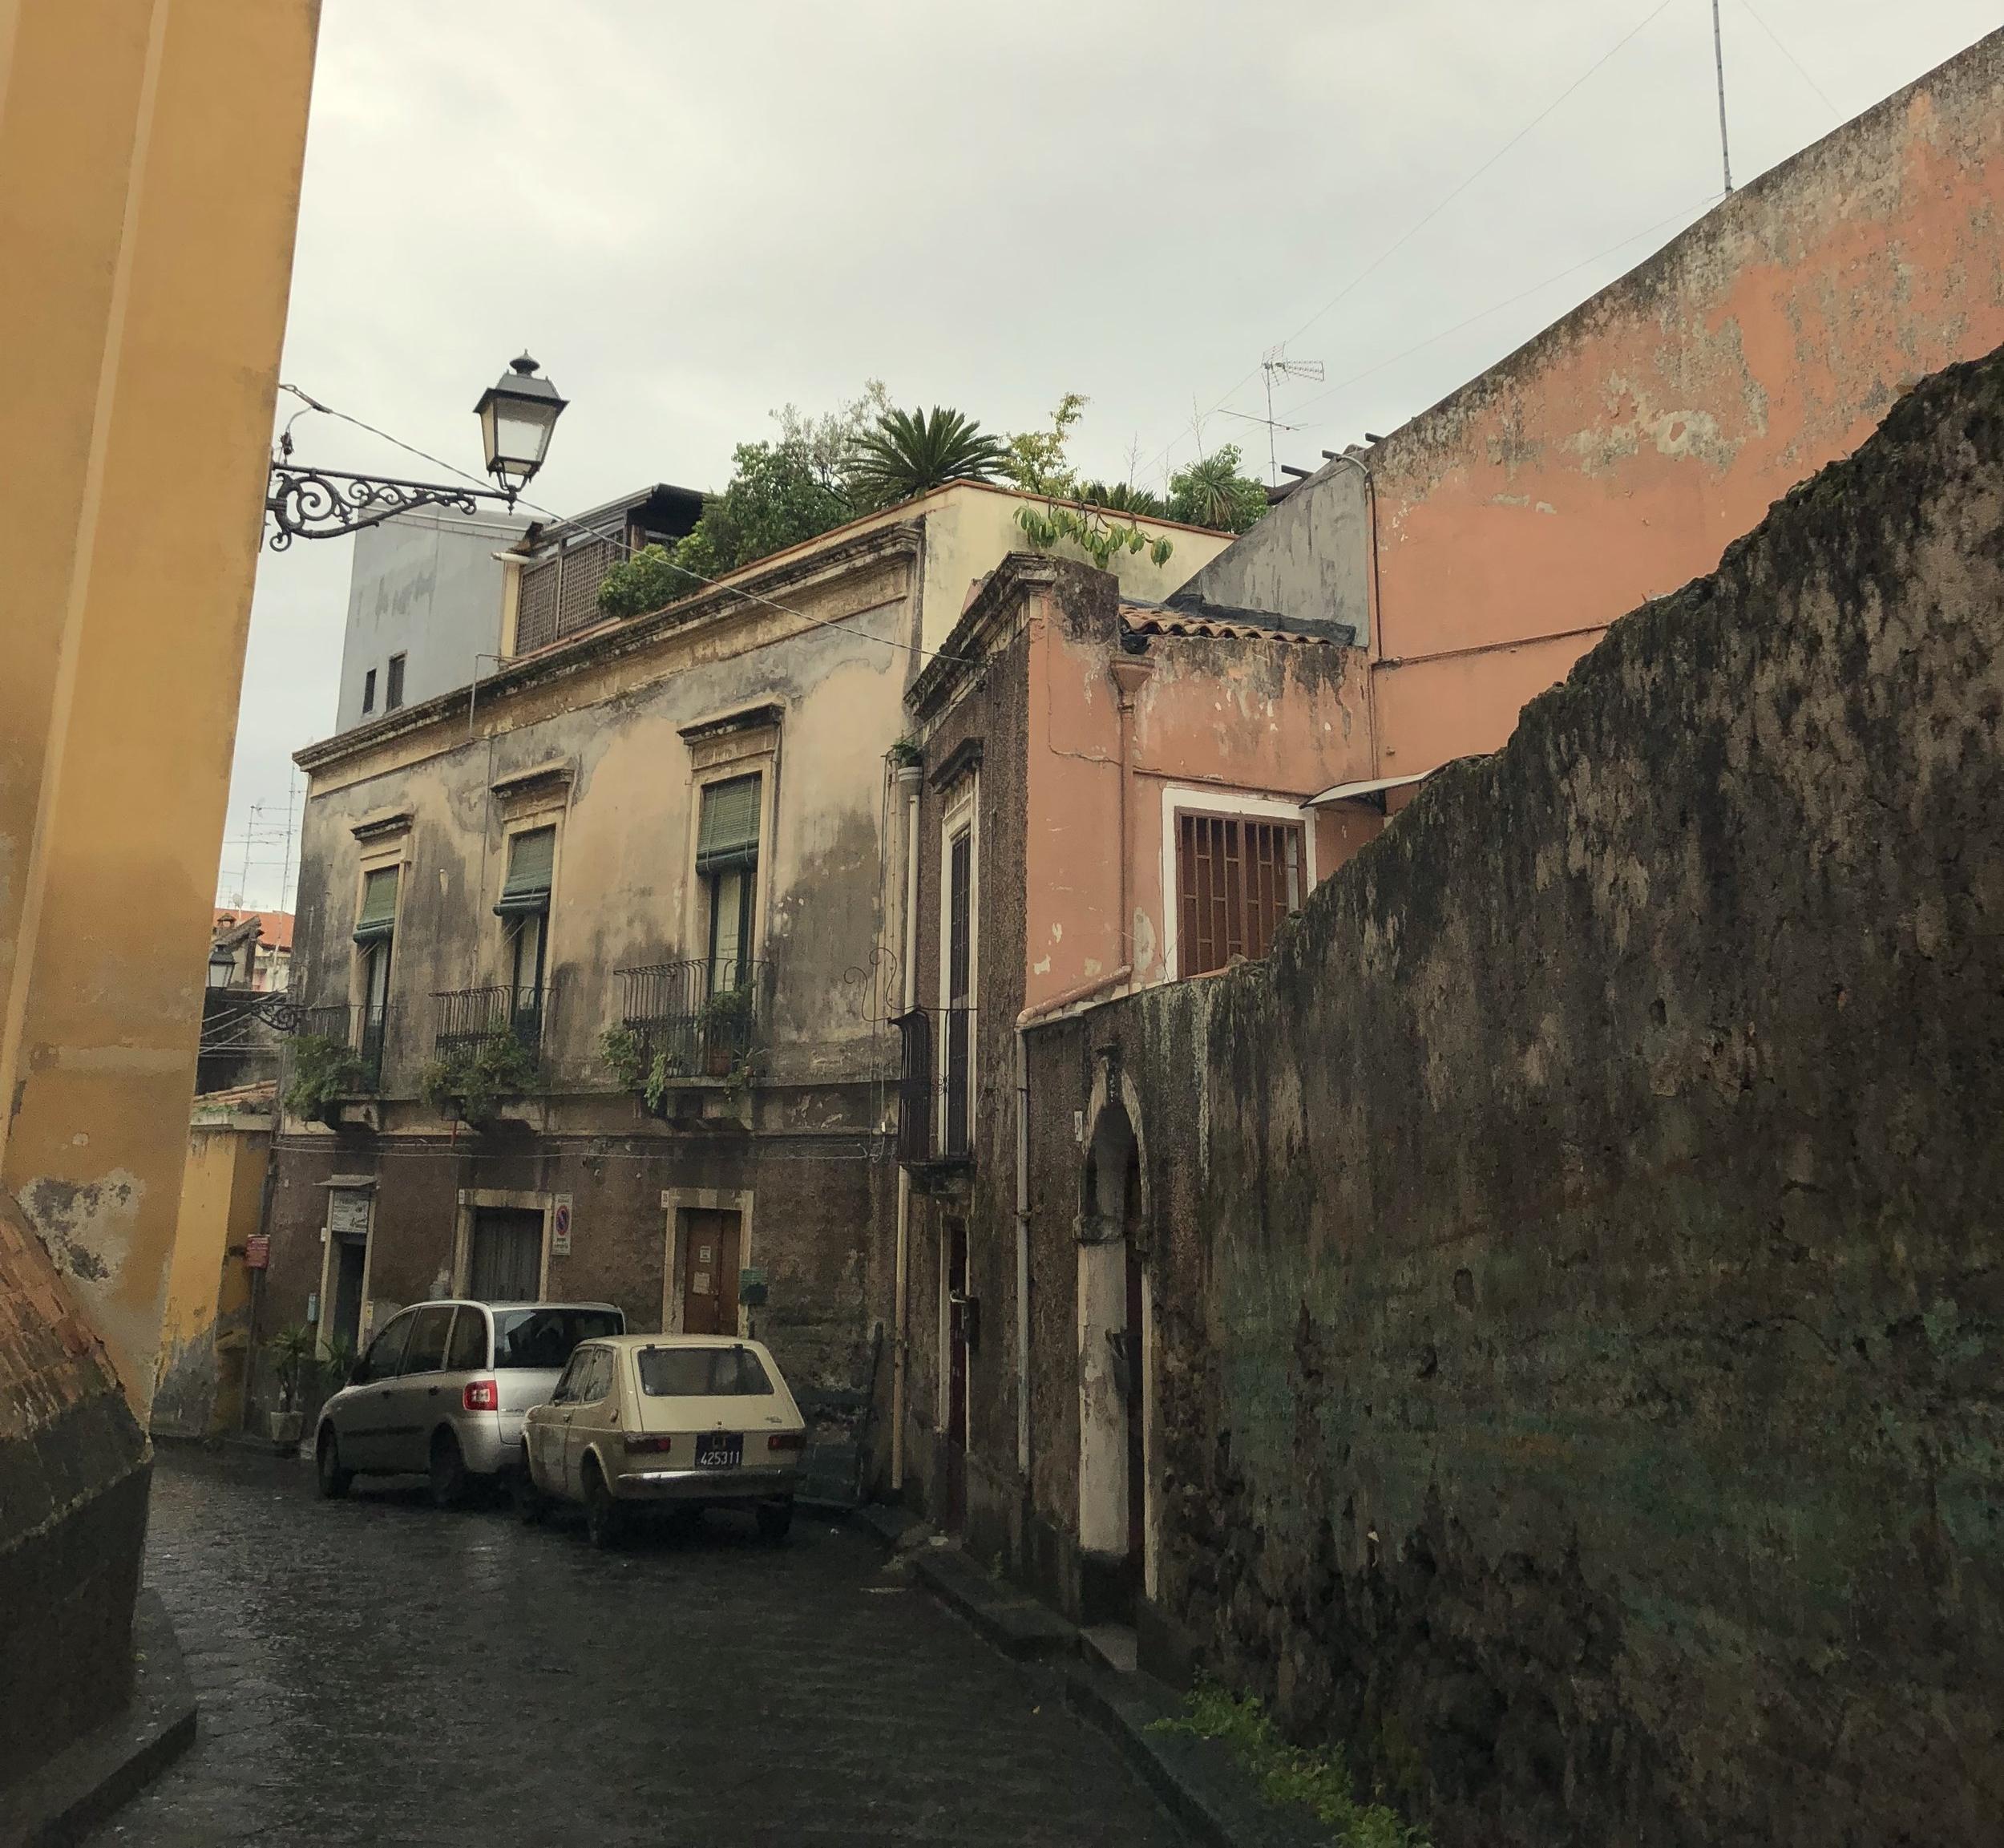 Acireale, Sicily